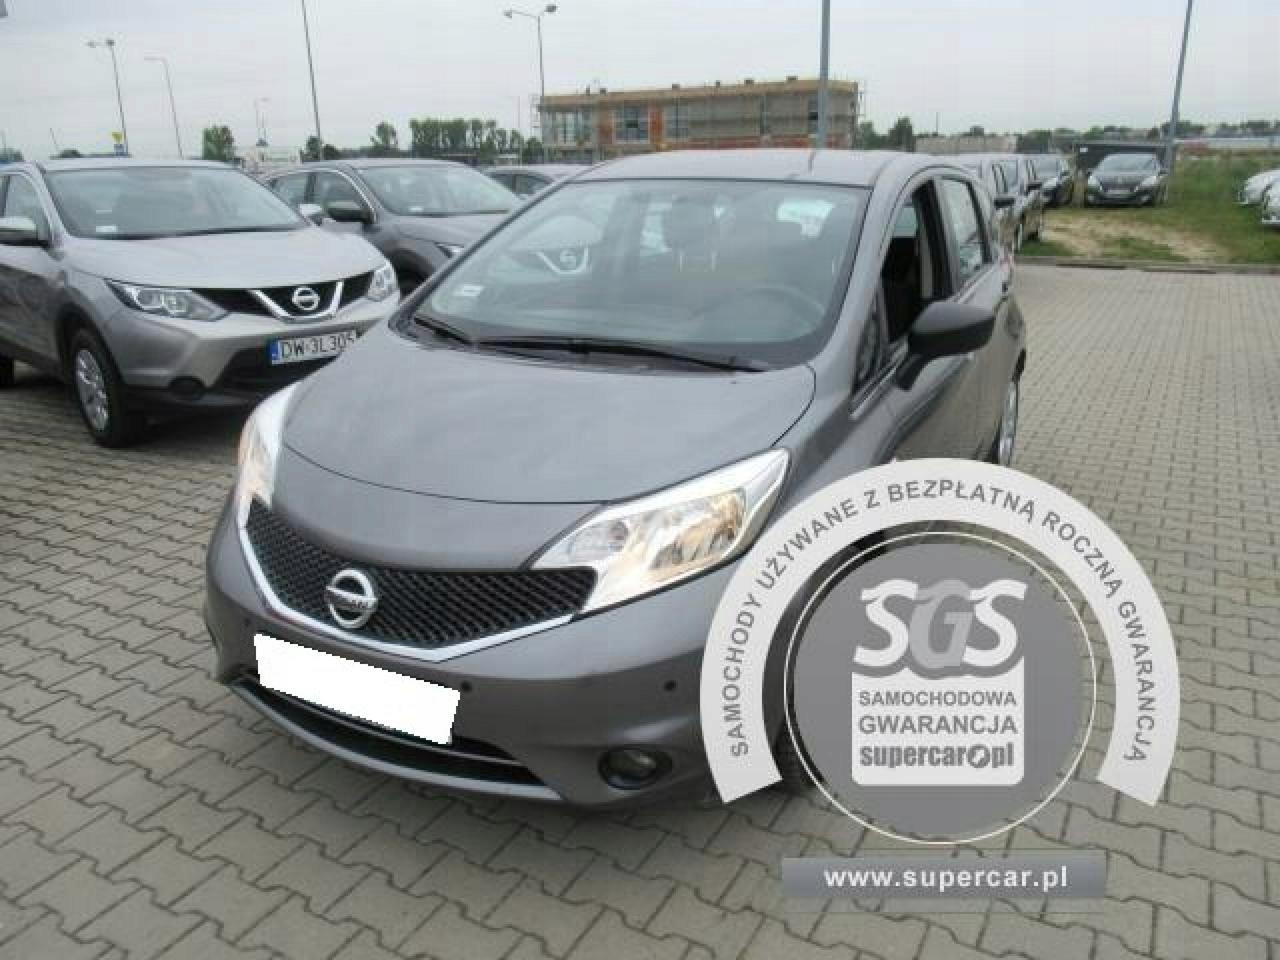 Nissan Note 1,5dCi Visia, 2015r, FV 23%, Gwarancja